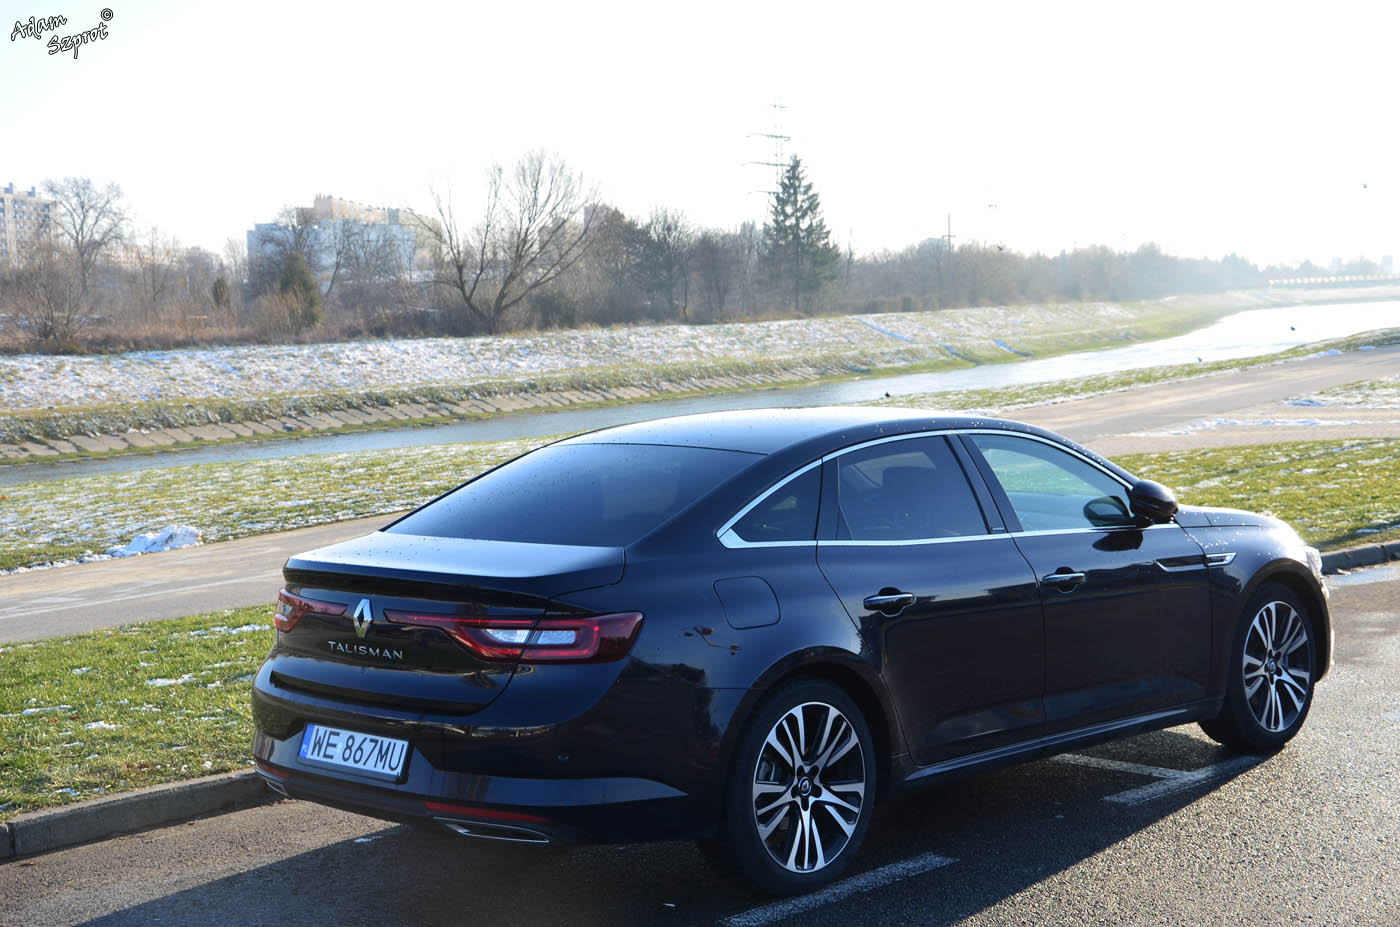 Renault Talisman Tyl B Test Samochodu 3dosetki Pl 4